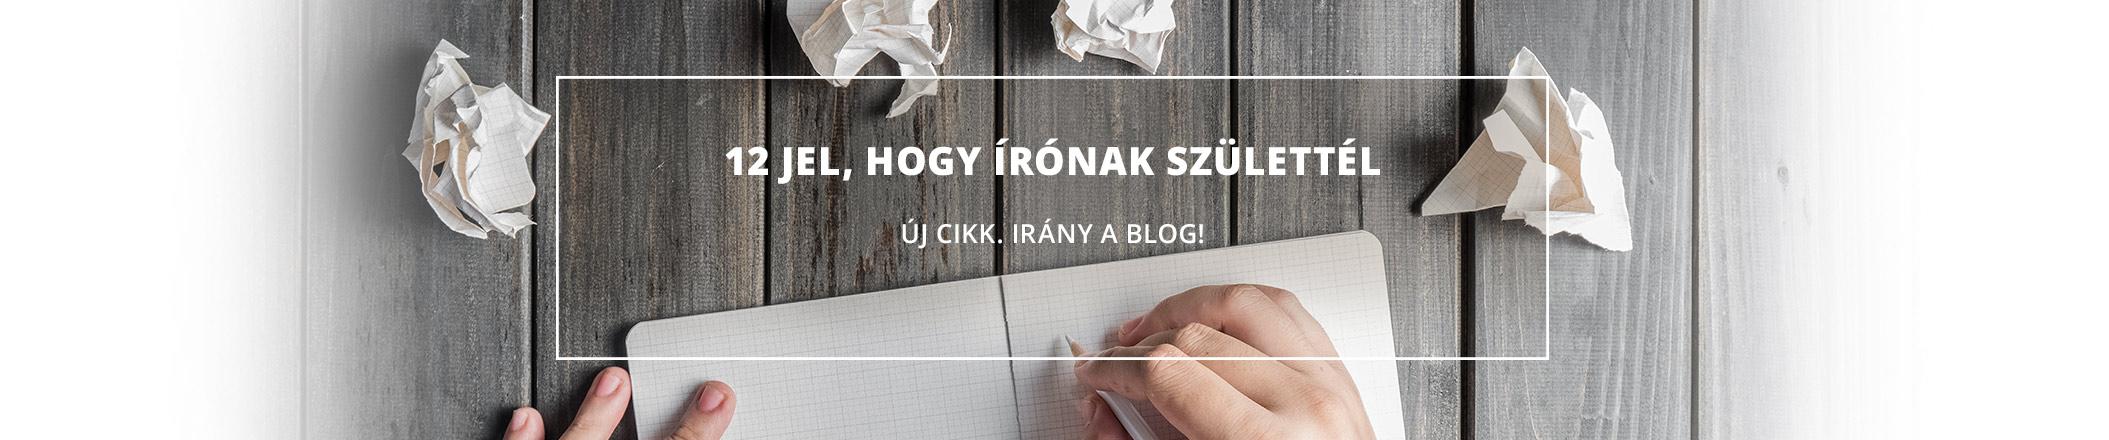 mybook_blogpost_47_slide